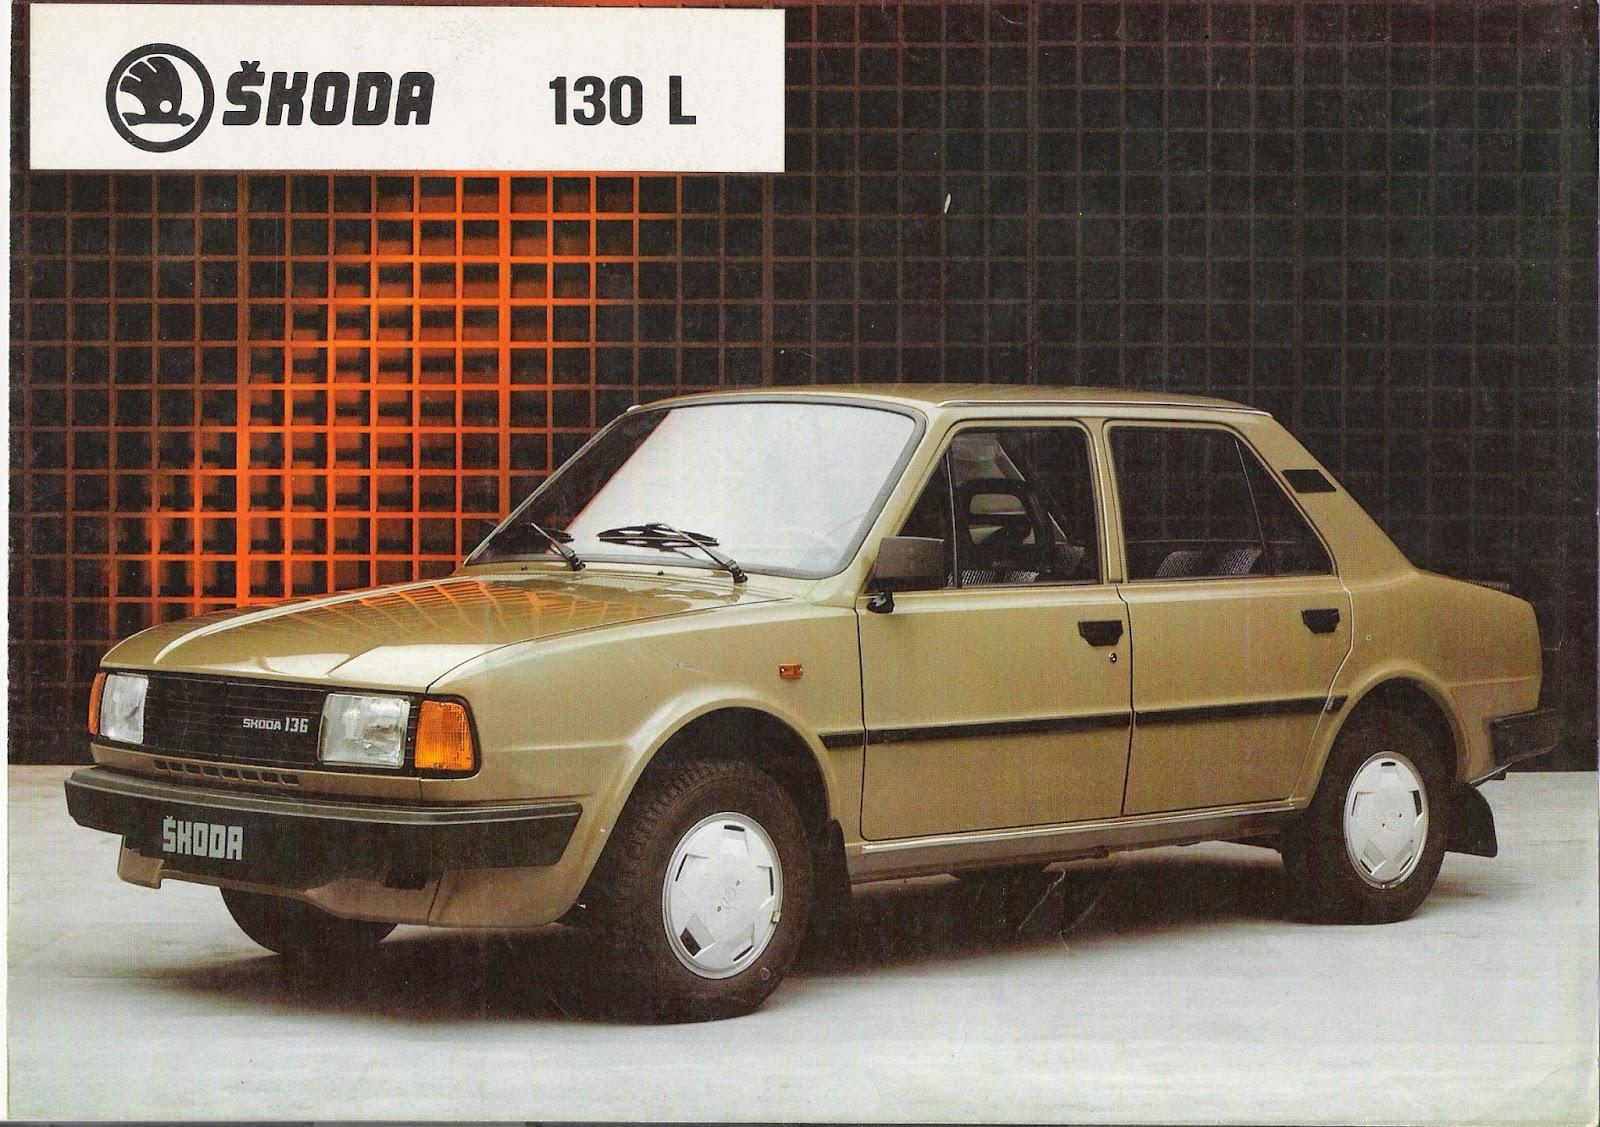 skoda-105-120-130-prospekty-francuzsky-plagat-skoda-130-l-hneda